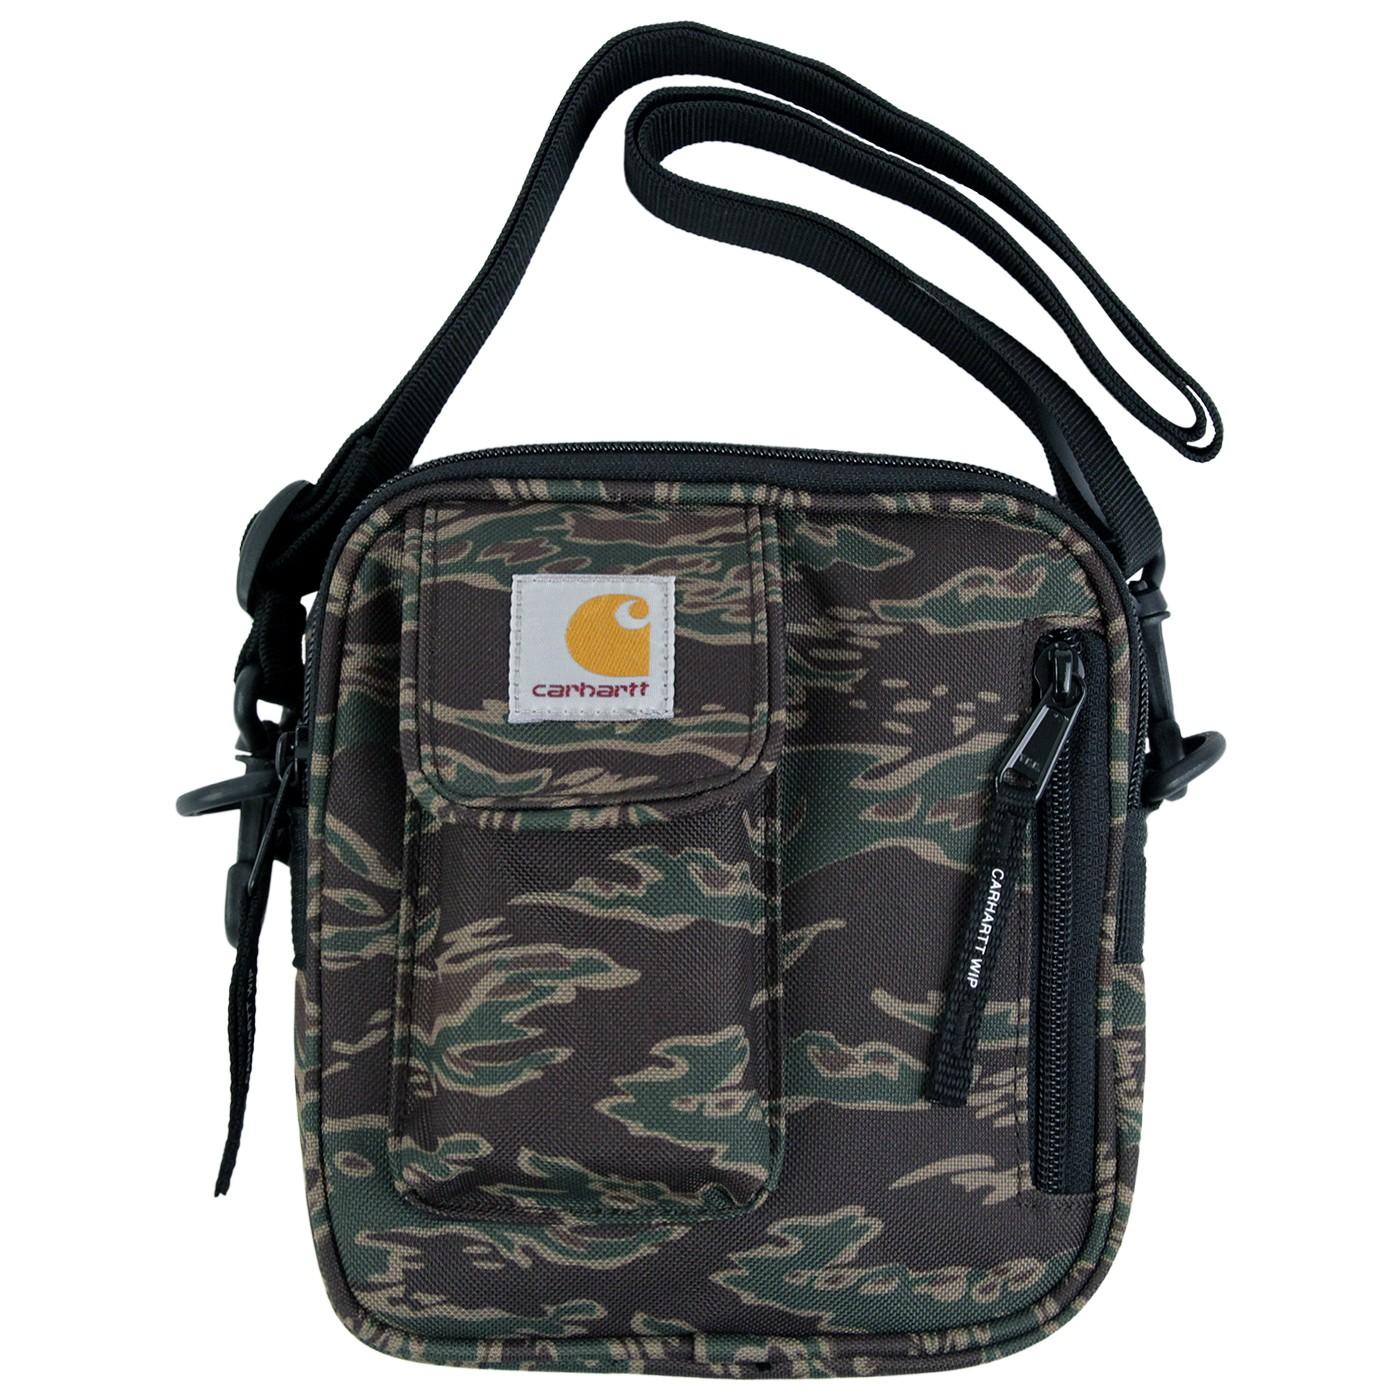 f9e7b3b7972 Very Goods | Essentials Bag in Tiger Camo by Carhartt